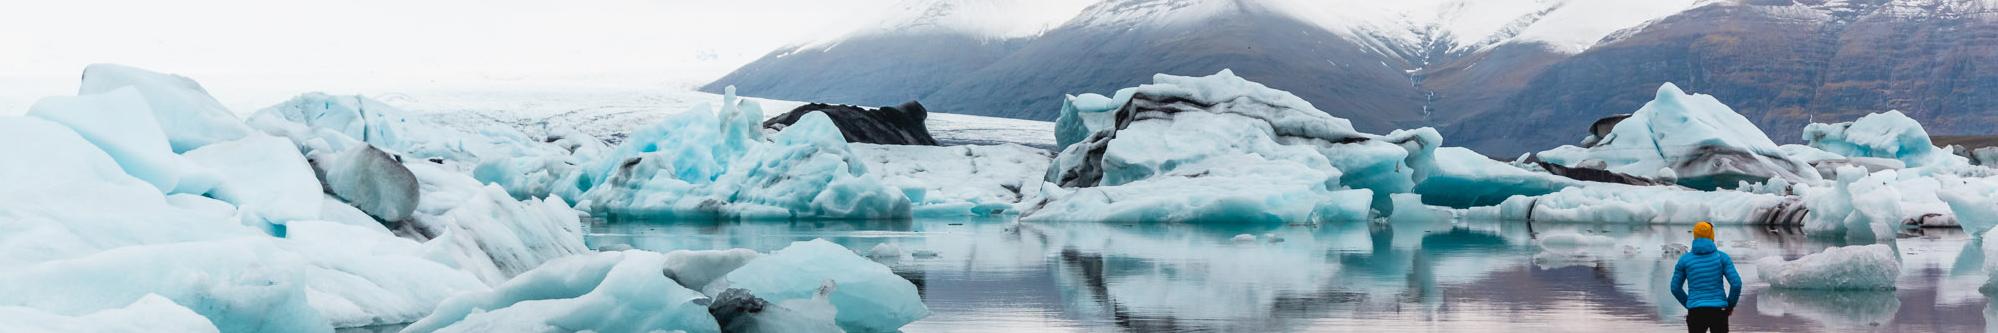 jokulsarlon-glacier-iceland